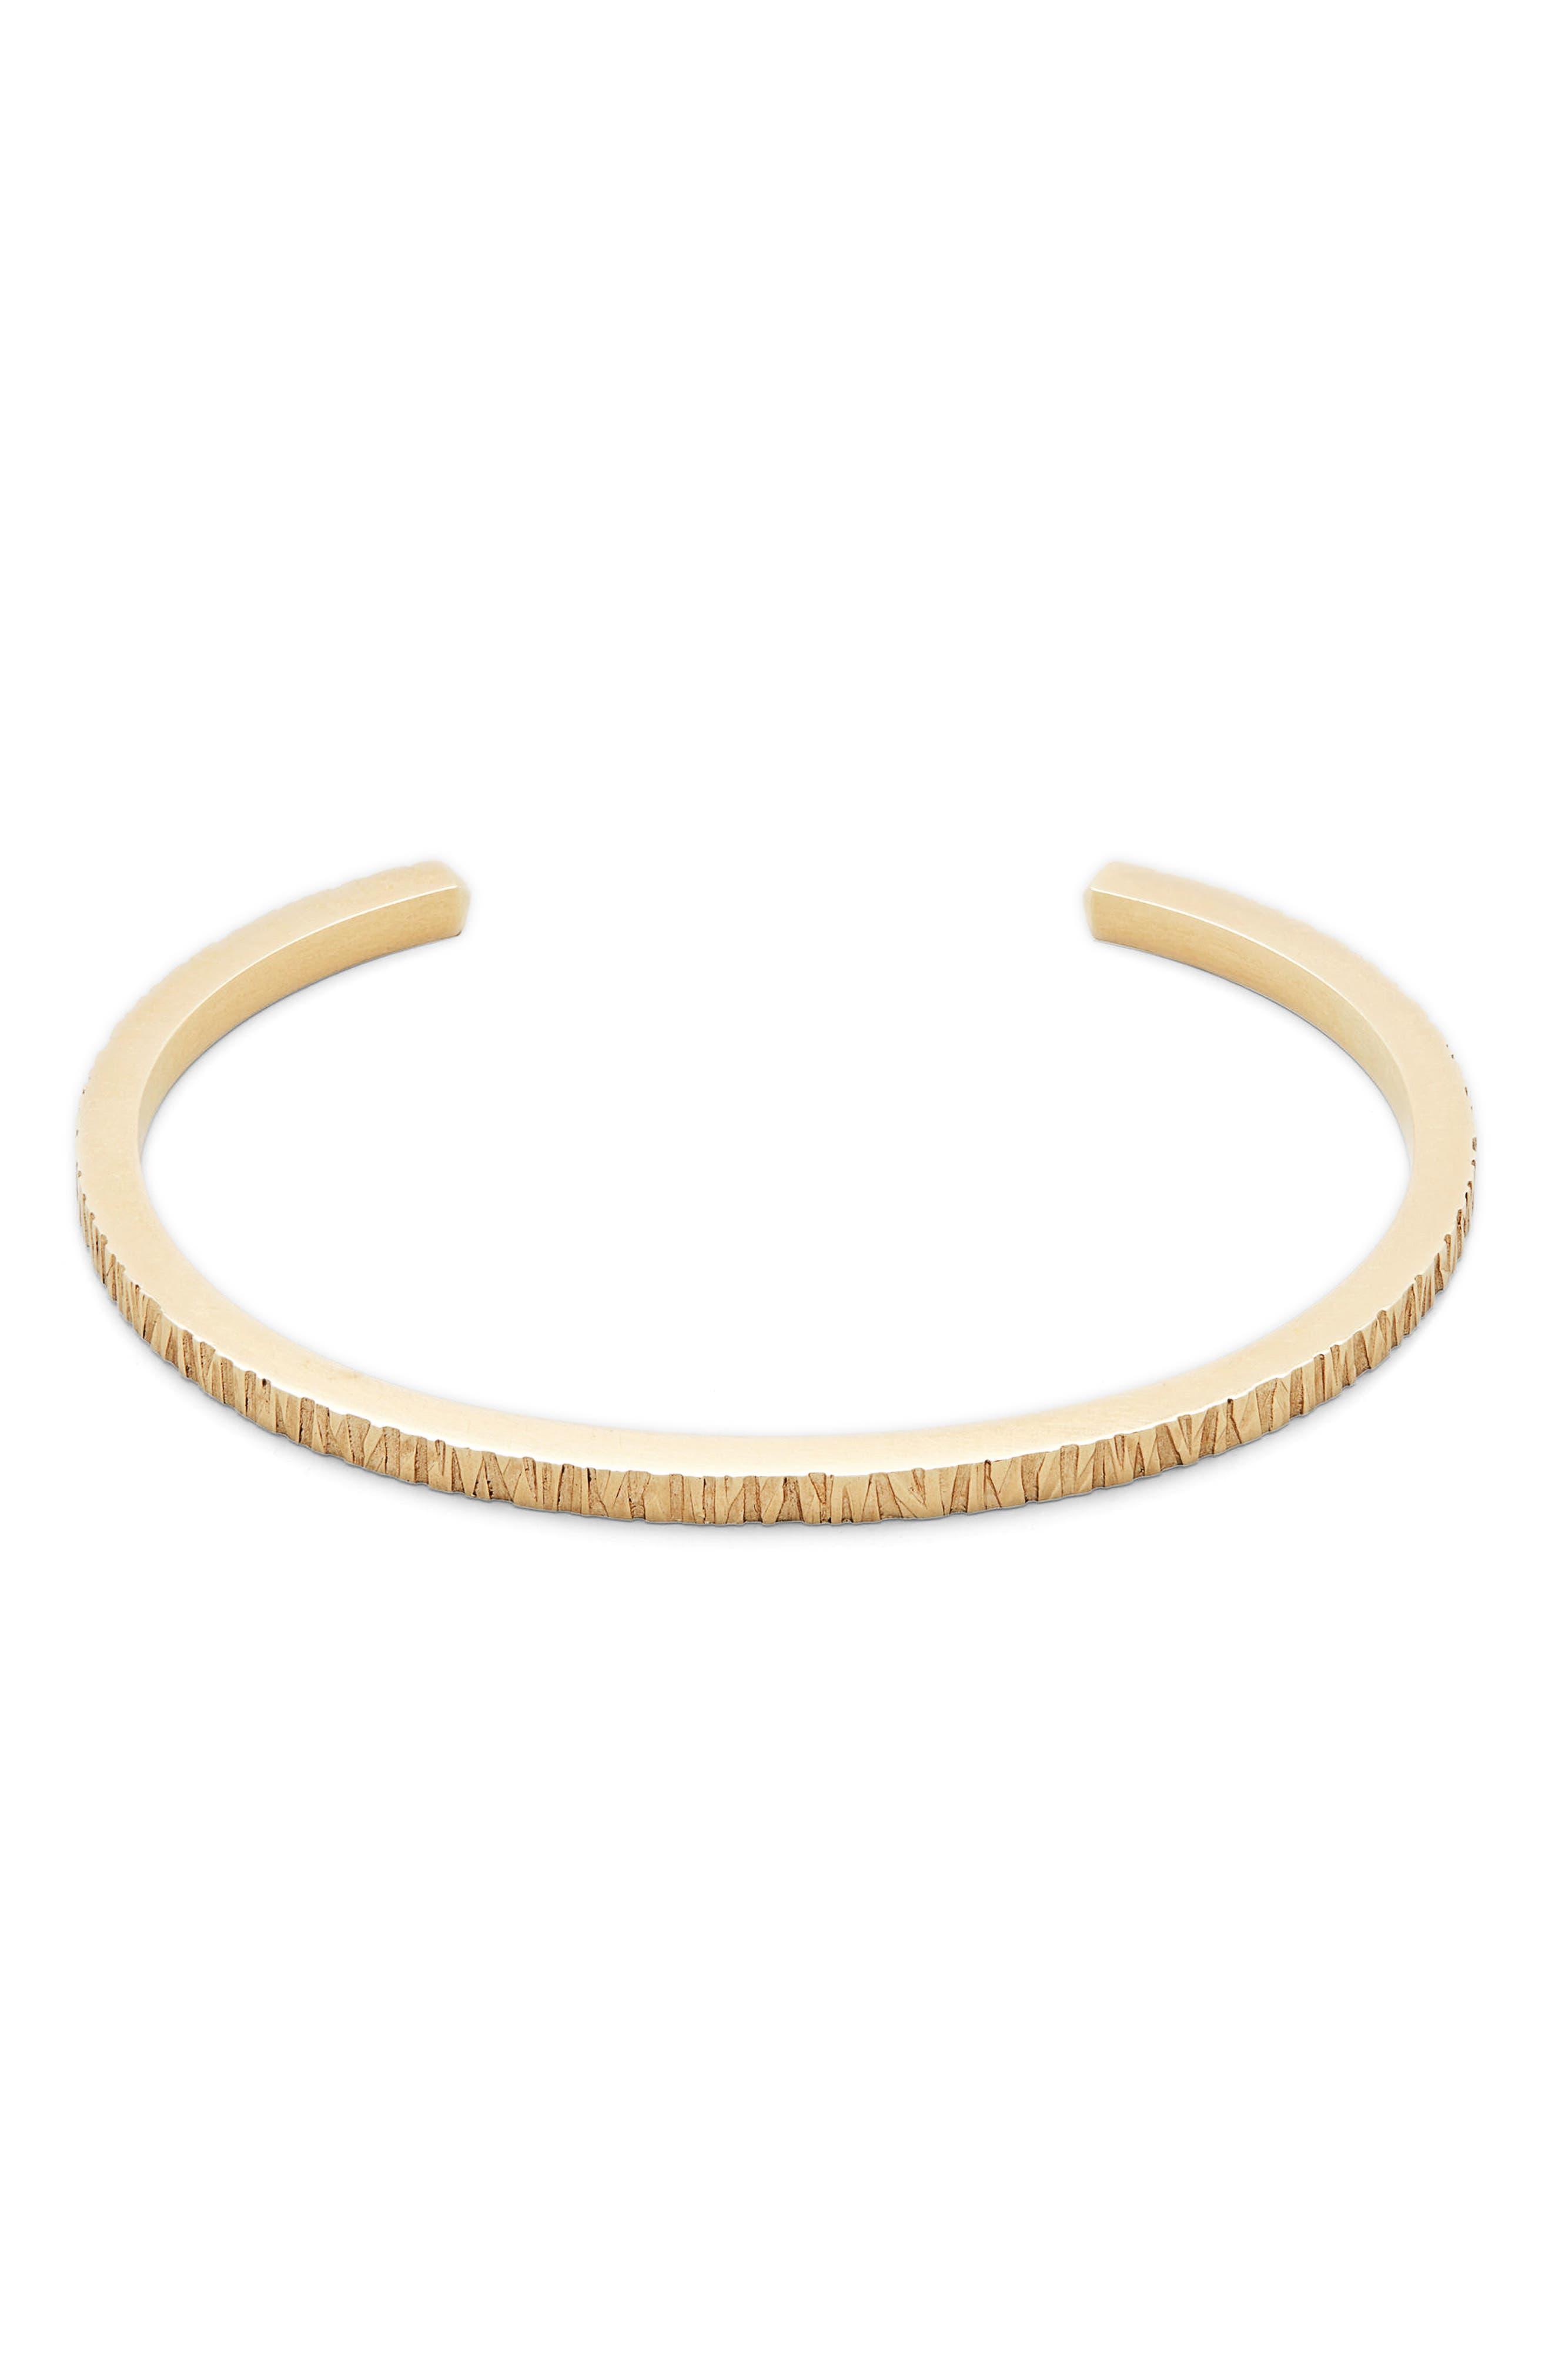 Tom Wood Structured Cuff Bracelet